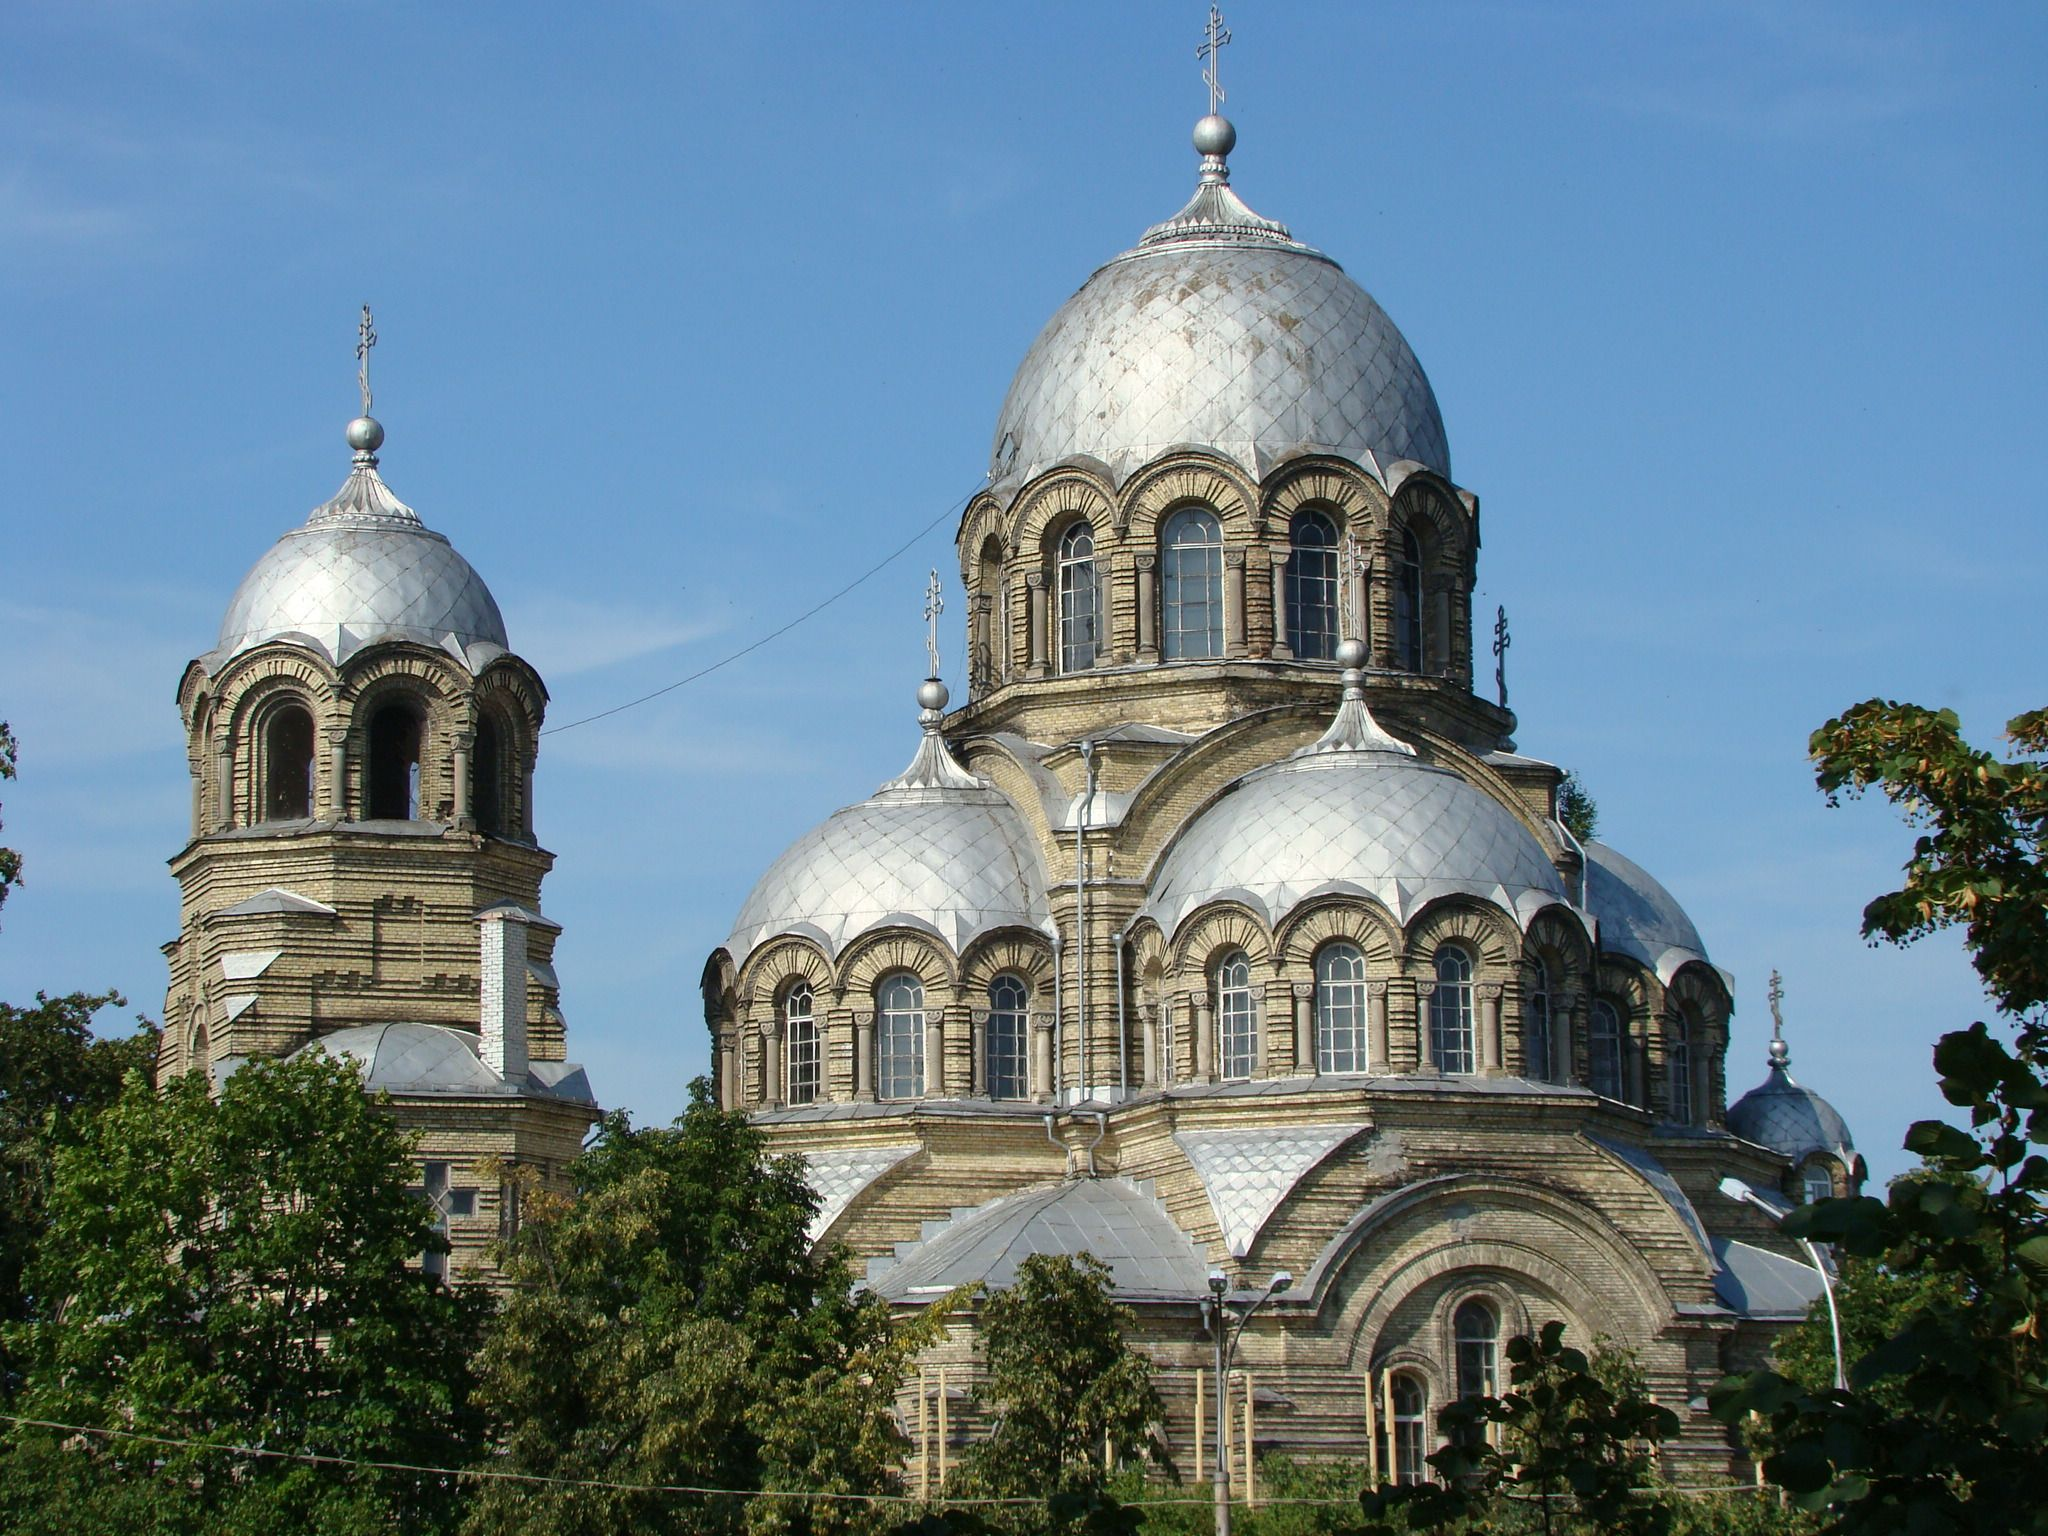 byzantine architecture | neo-byzantine architecture | architecture